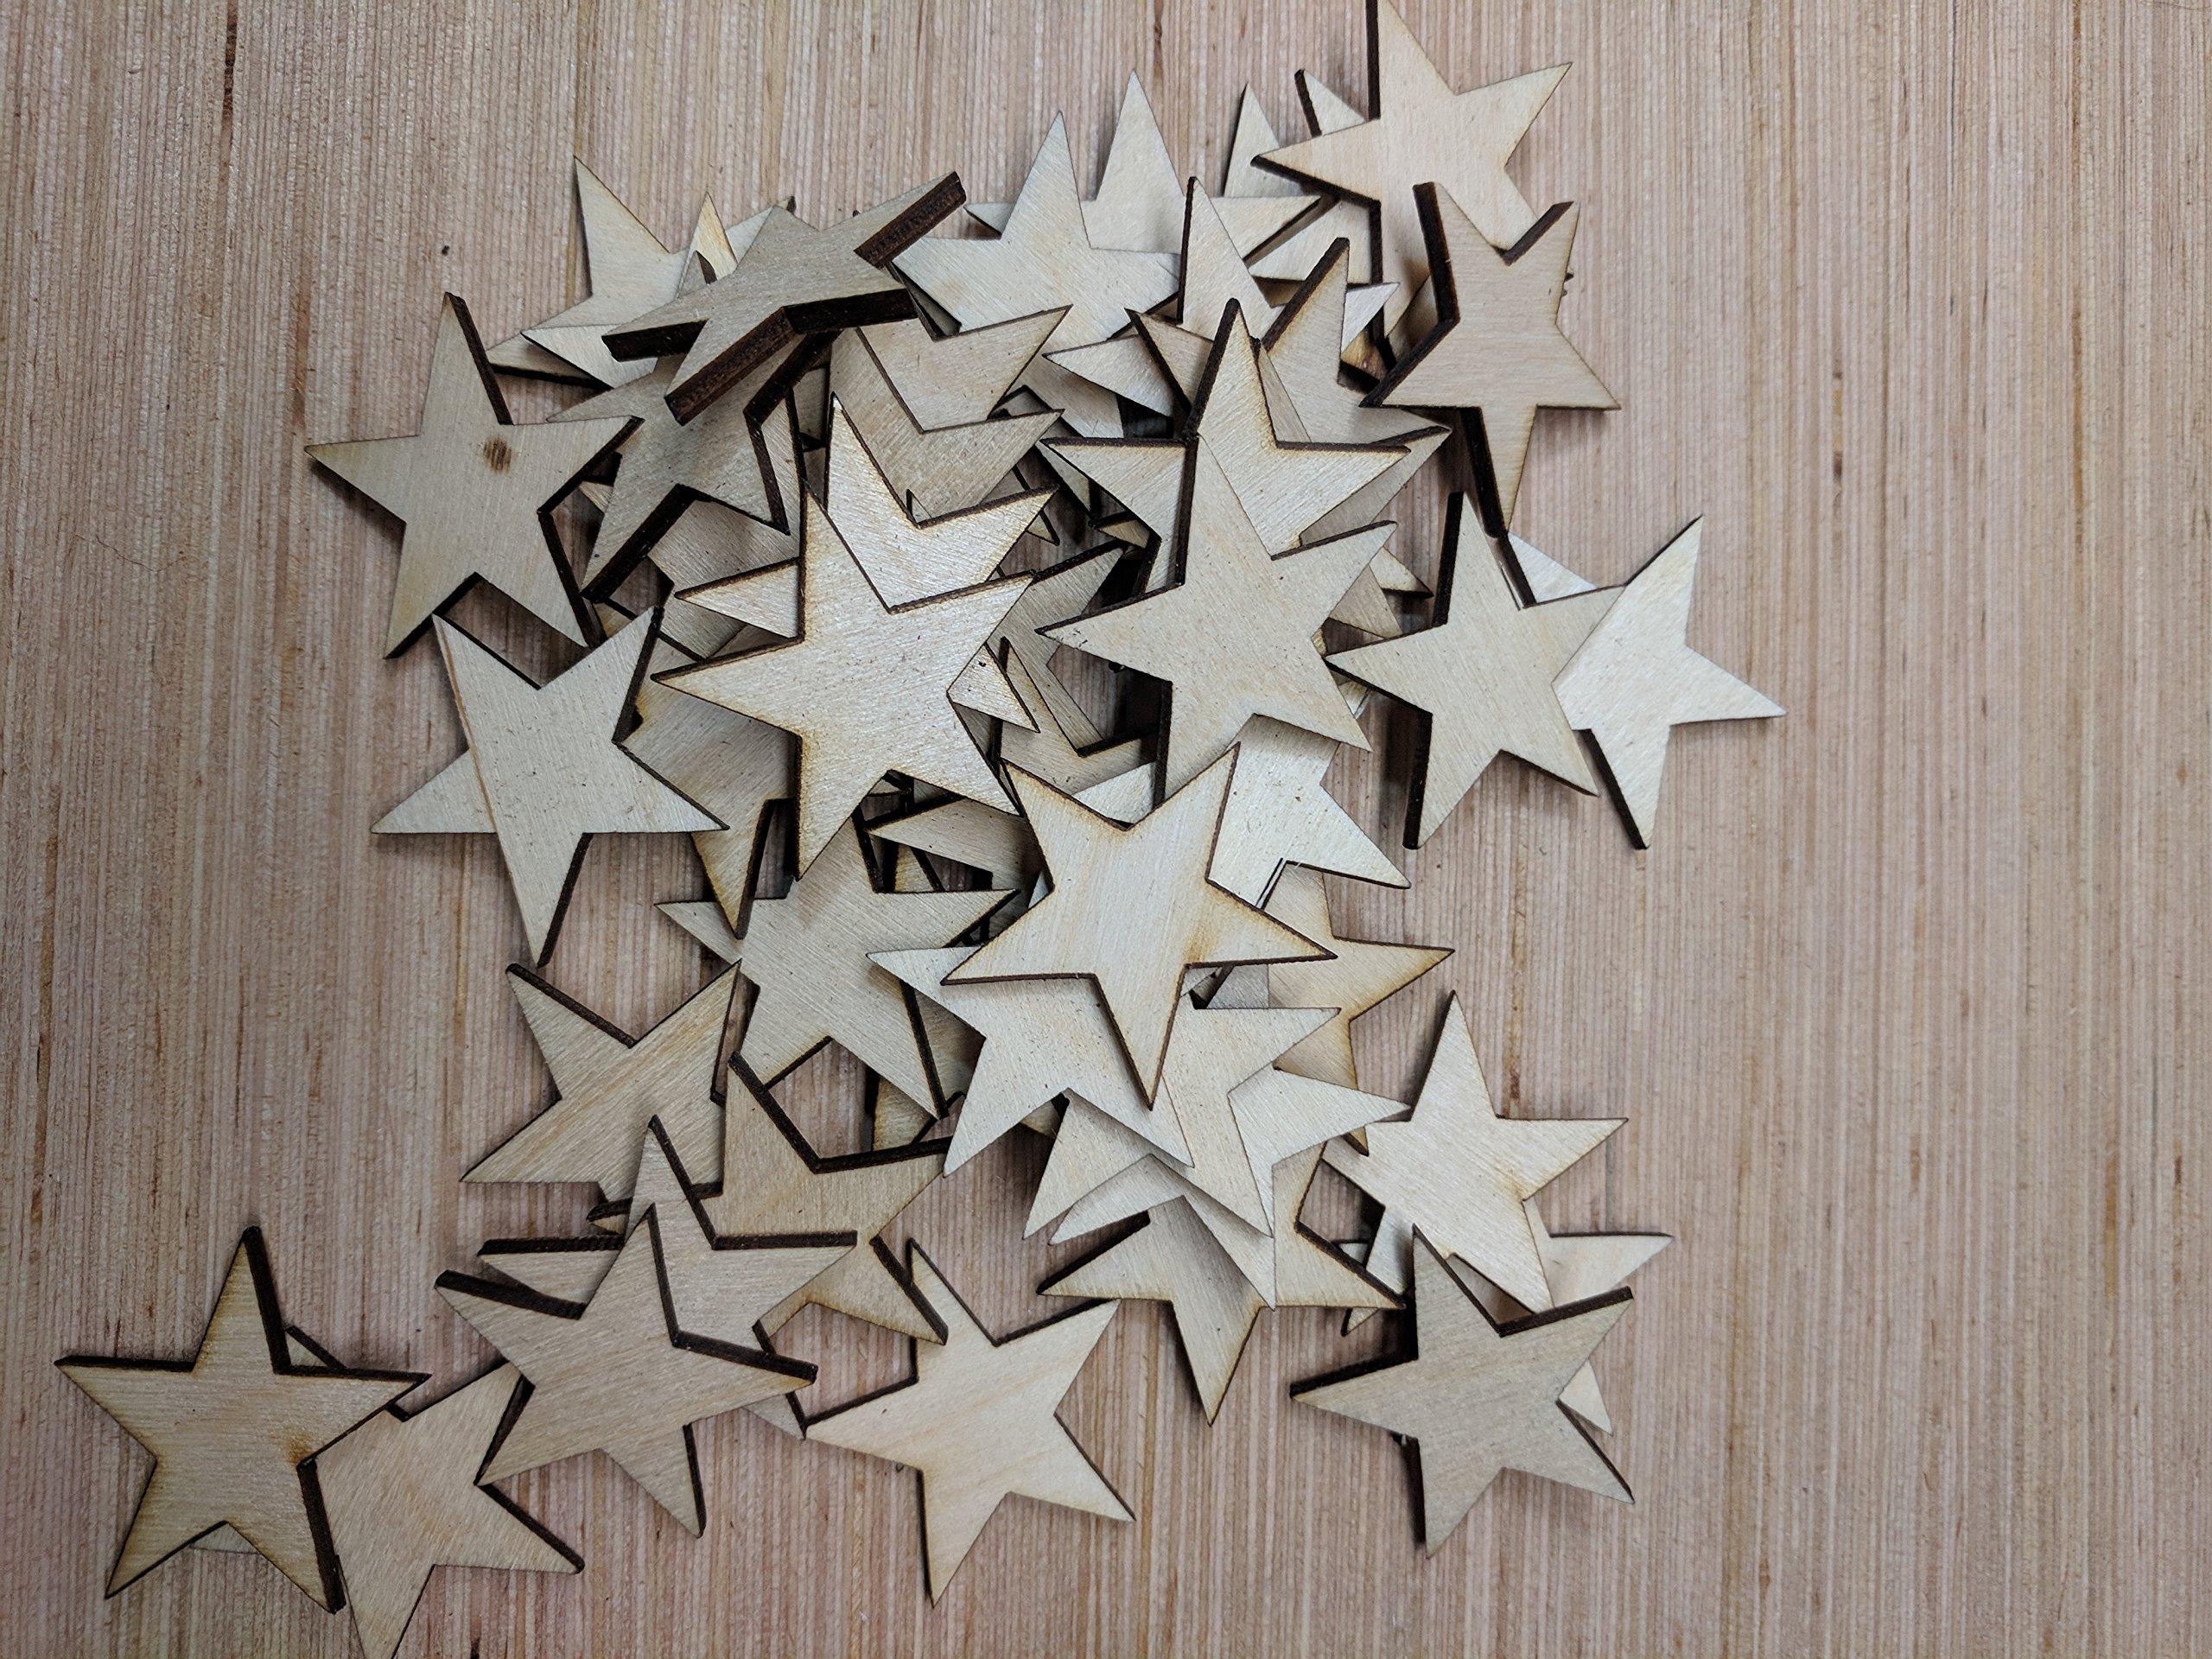 1000-1.25 inch Mini Wood Stars - Laser Cut, Flag Making 1 1/4'' Wooden Stars- DIY Craft Supplies Flag Making, Rustic Decor, Wood Confetti, Patriotic